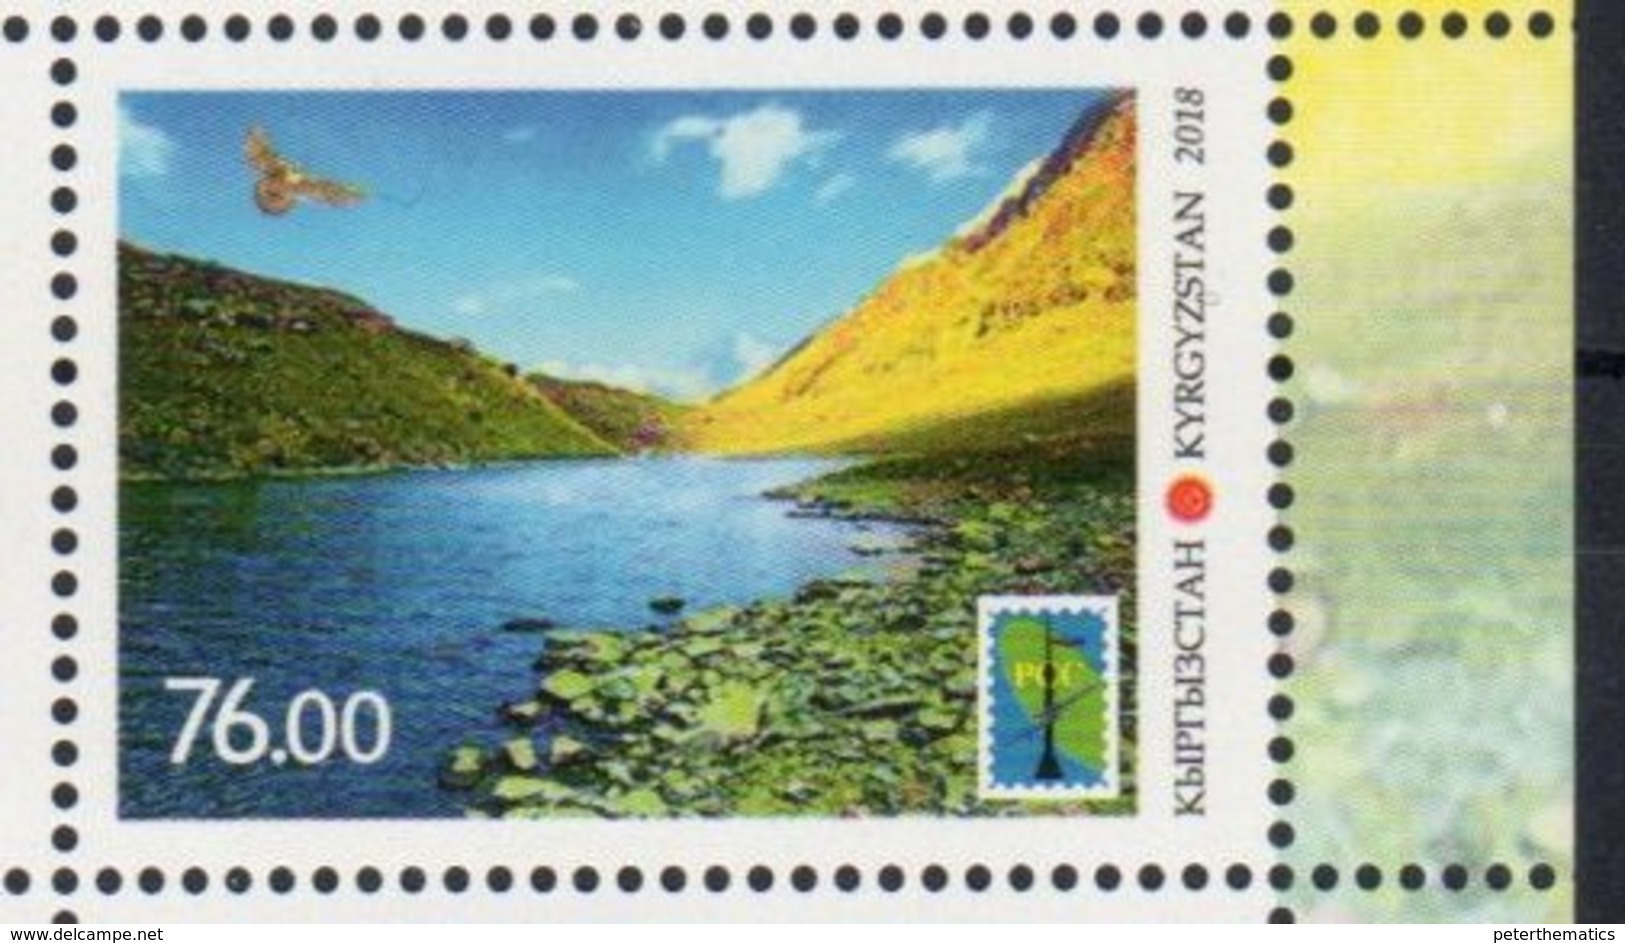 KYRGYZSTAN, 2018, MNH, SURMA- TASH NATURE RESERVE, MOUNTAINS, BIRDS, 1v - Geology